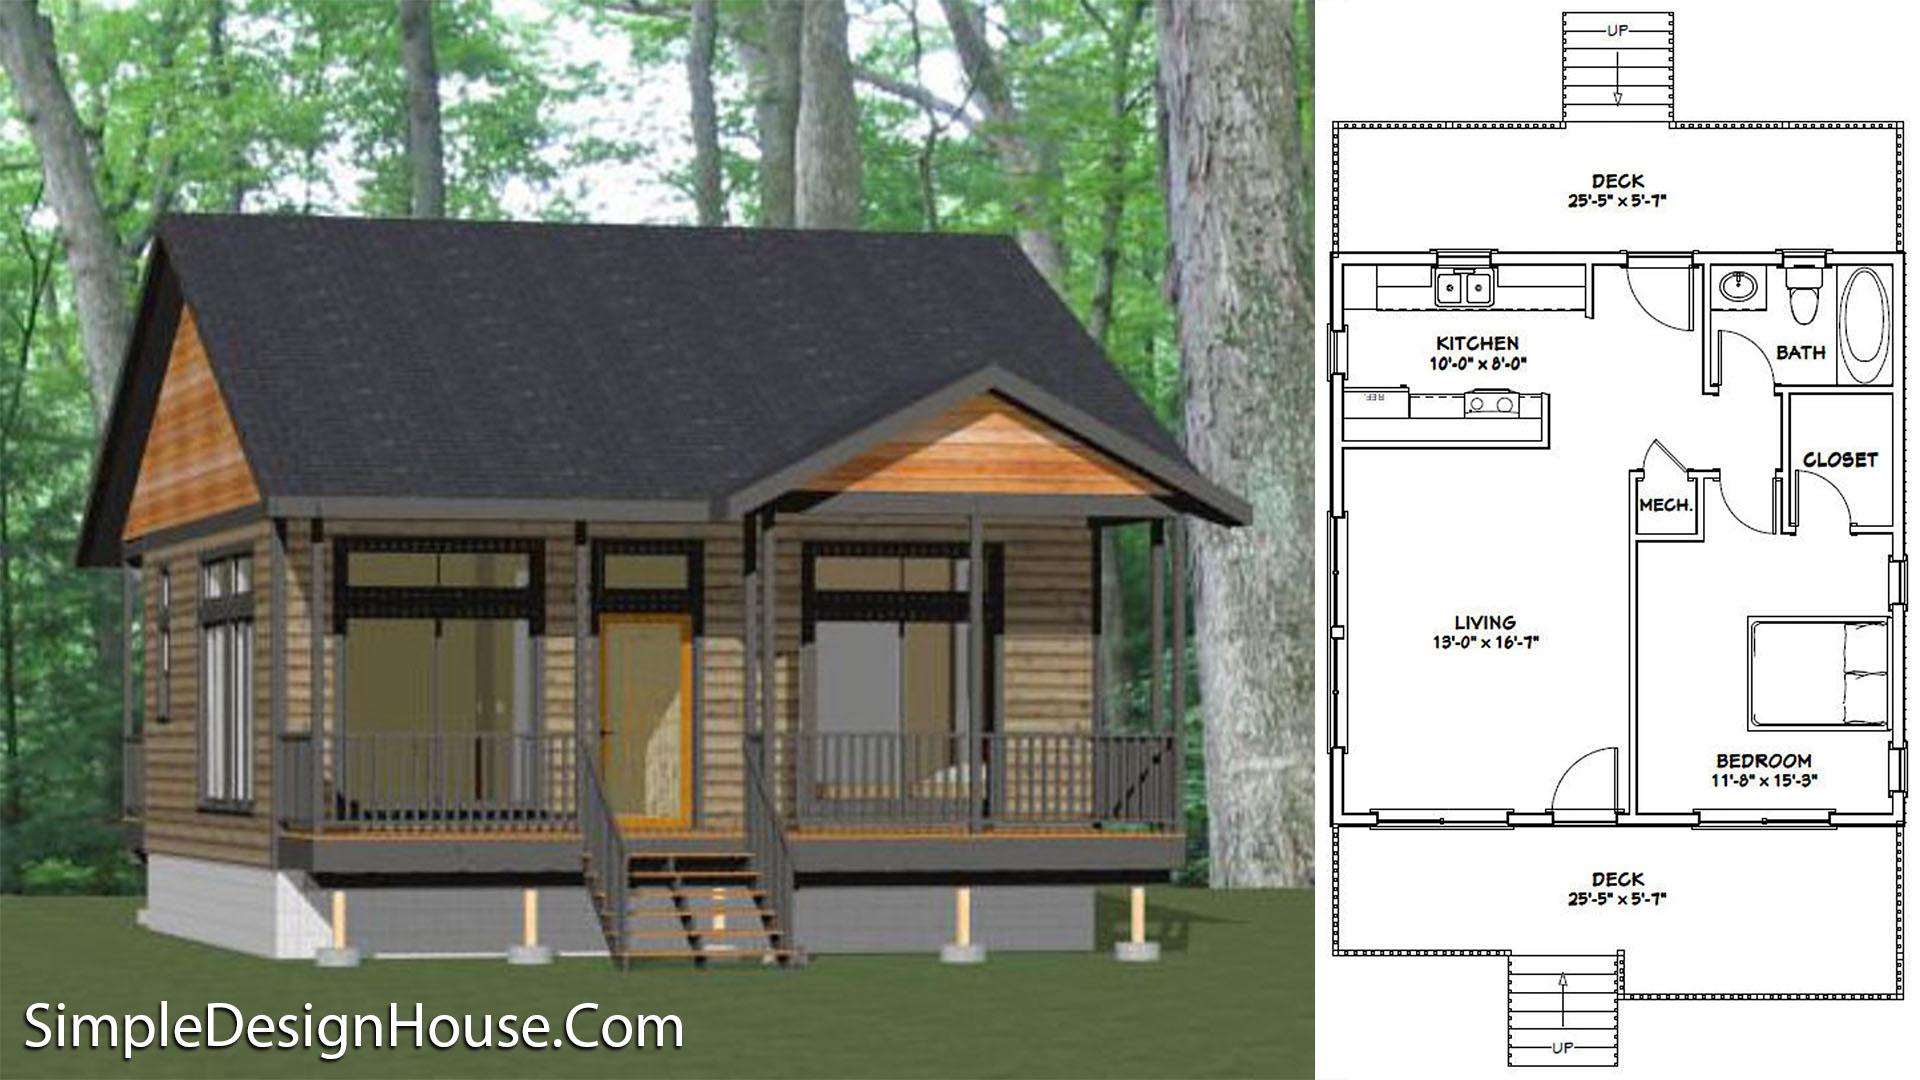 26×26 House Plans 1 Bedroom 676 sq ft PDF Floor Plan